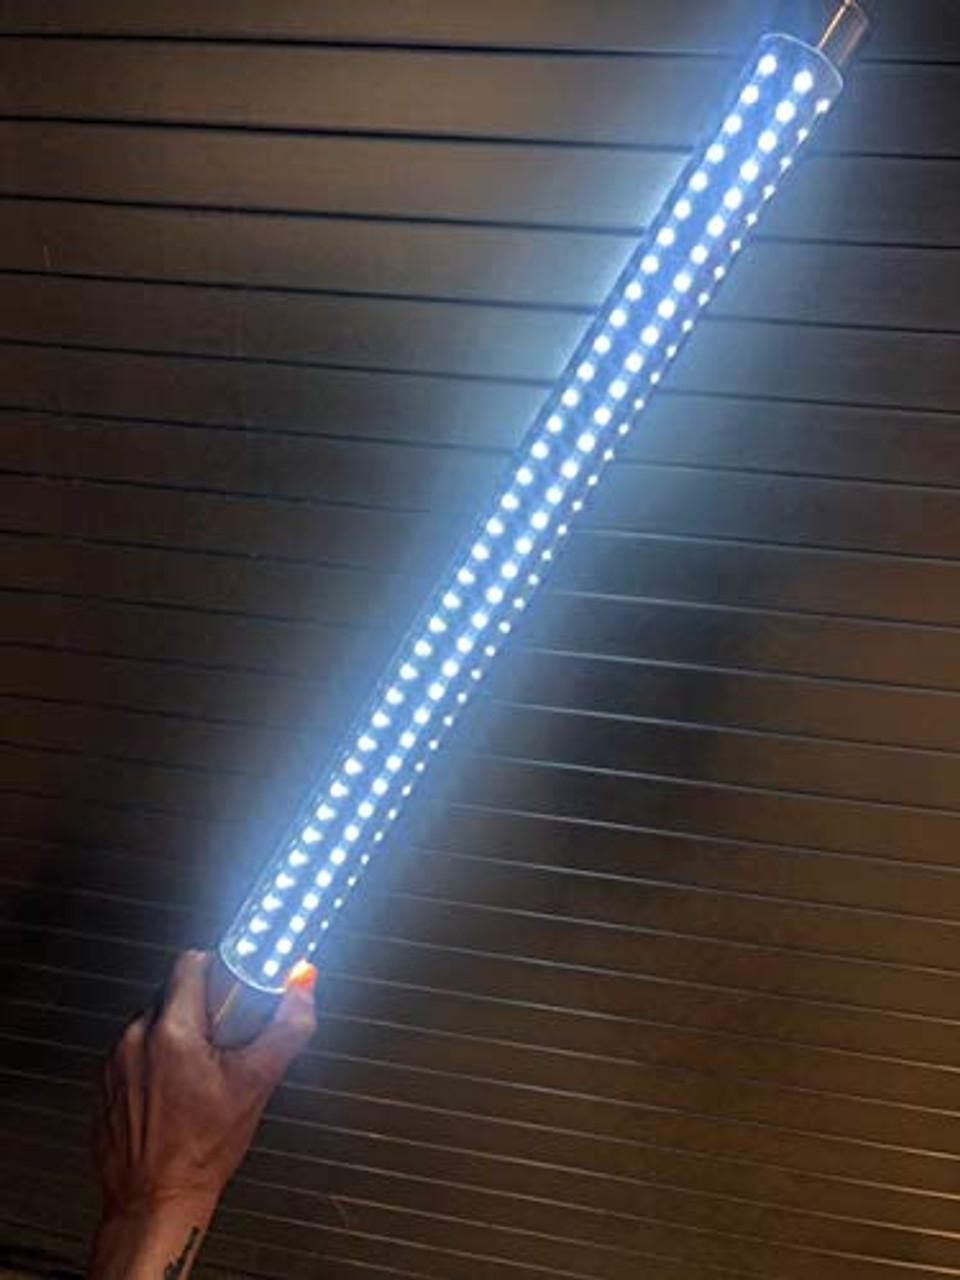 LED,Sparklers, Jumbo,XL, strobe,Saber, sparkler, electronic, alternative, Saber Strobe